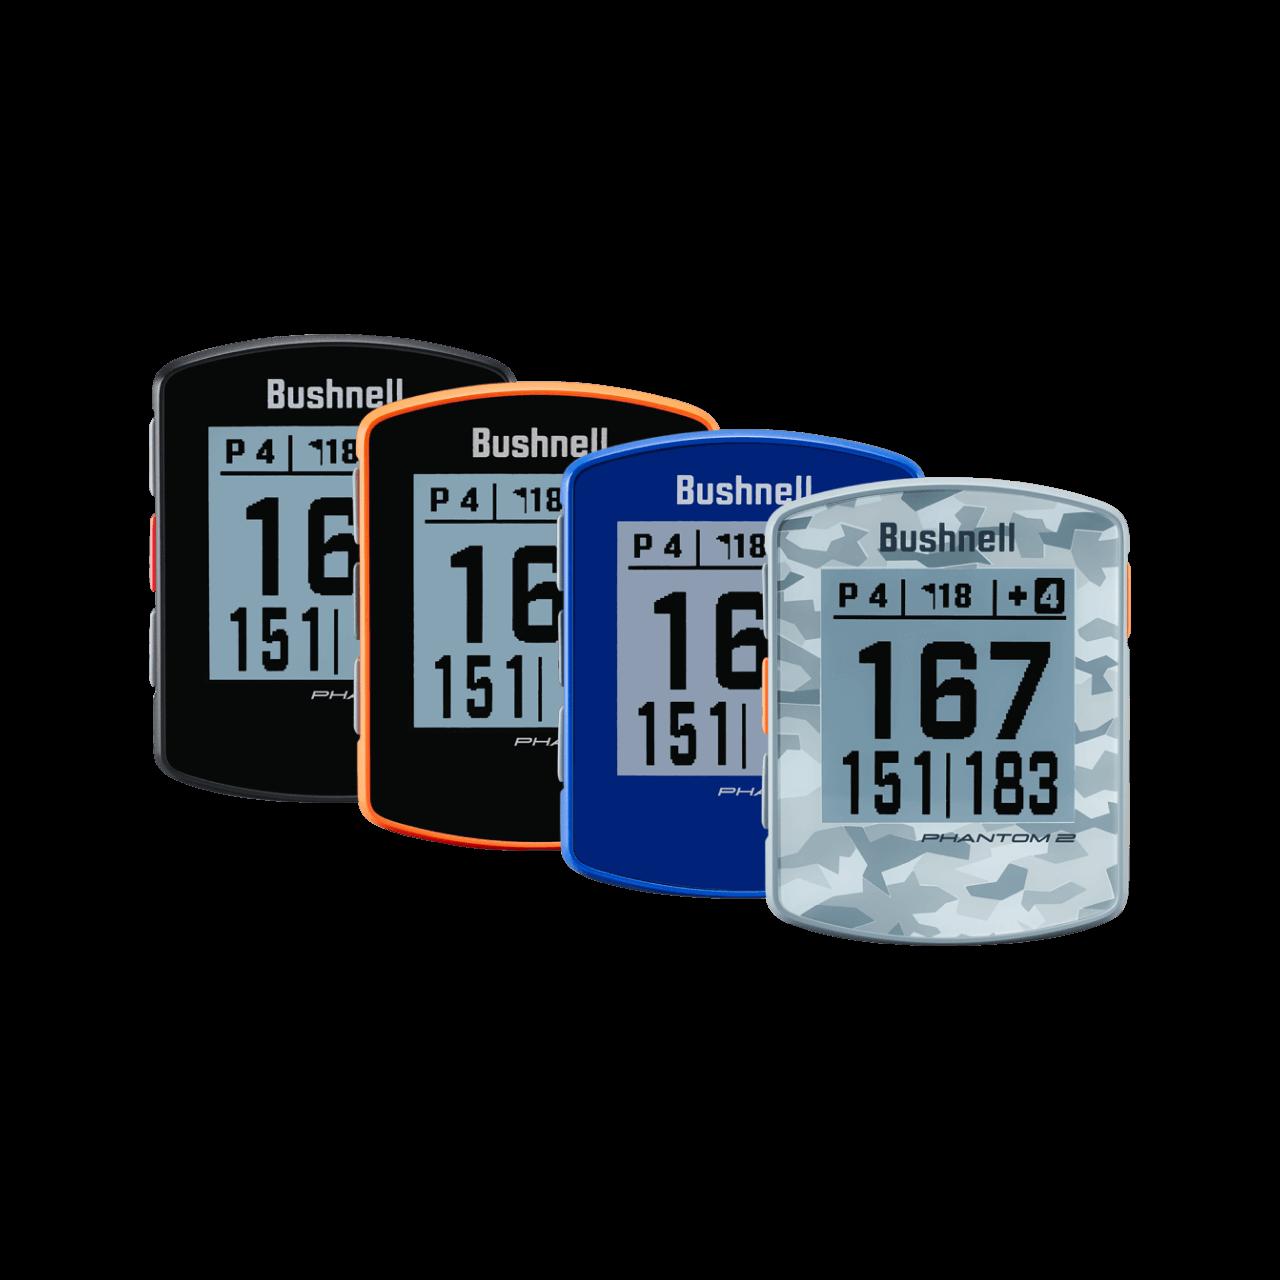 phantom2 GPS color options 85248.1618597212